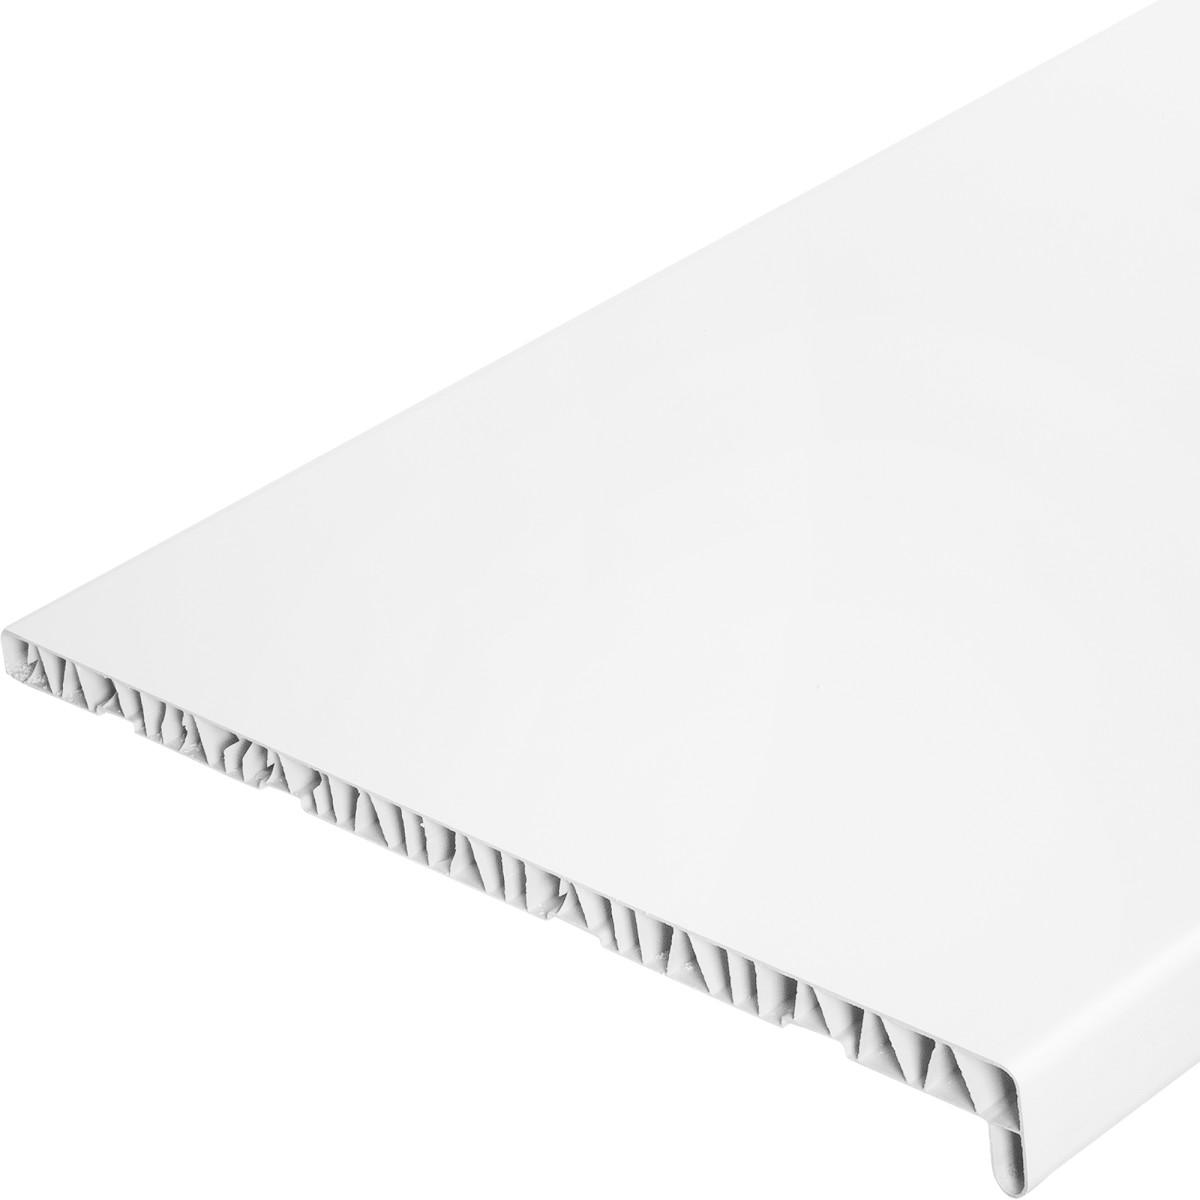 Подоконник ПВХ 500x2000 мм цвет белый